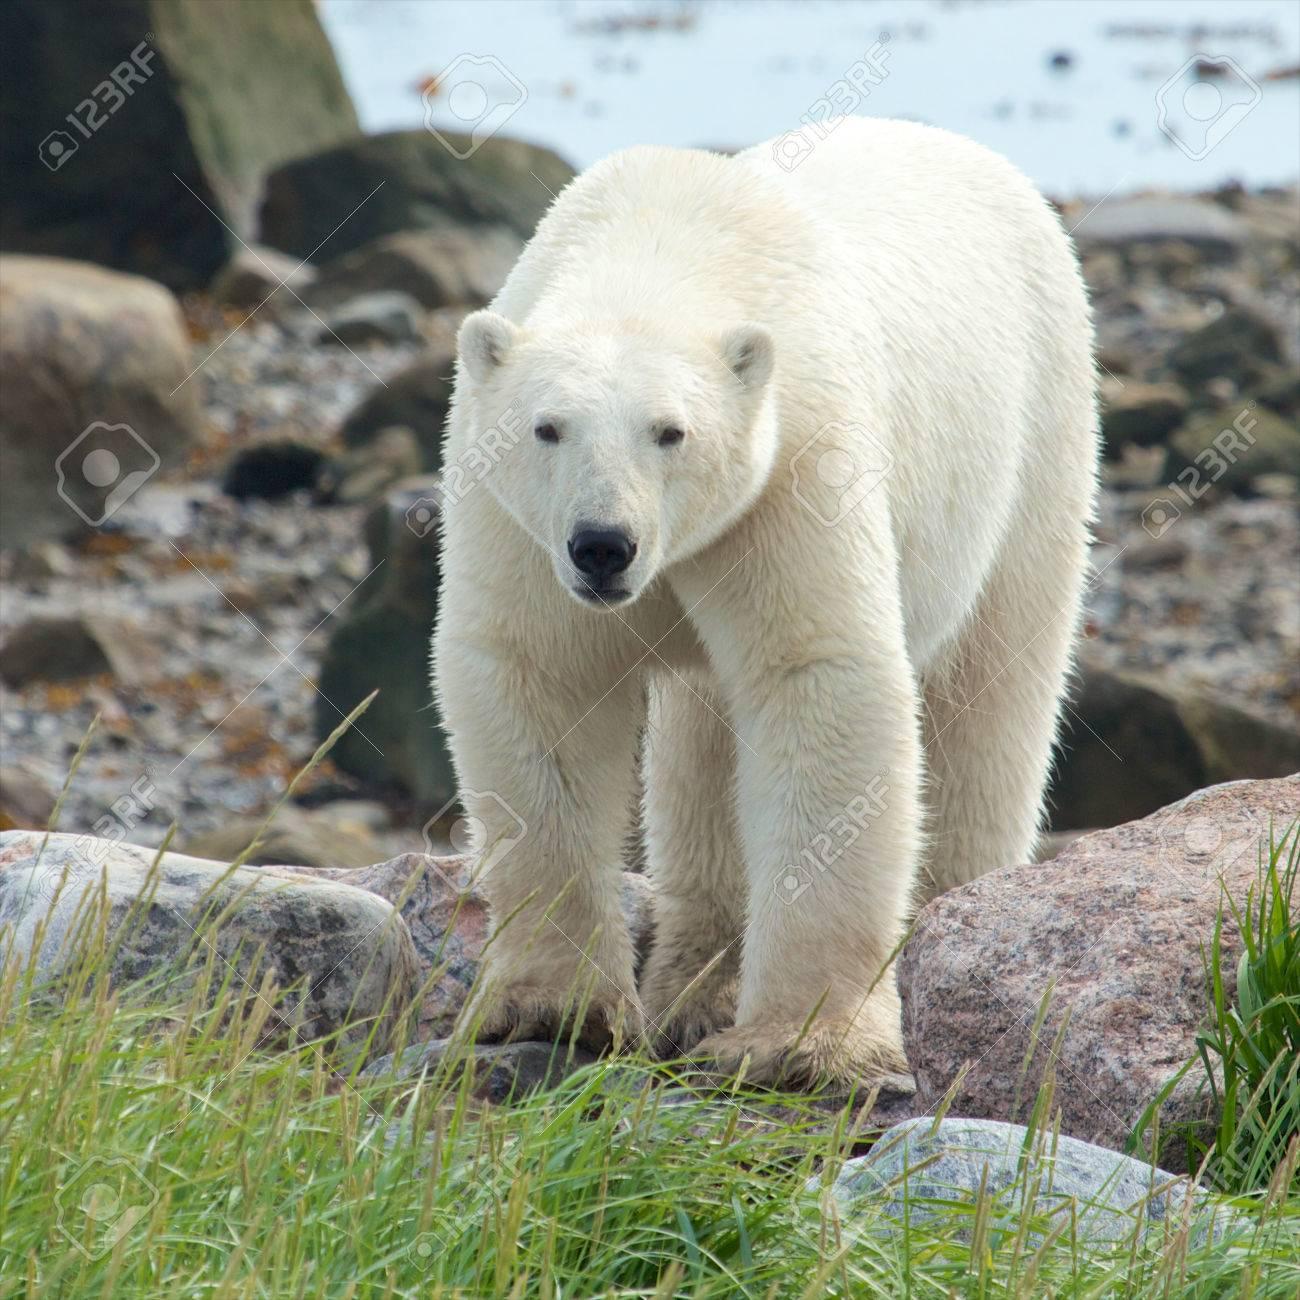 Curious Canadian Polar Bear walking along the shore of the Hudson Bay near Churchill, Manitoba, in summer - 23181419